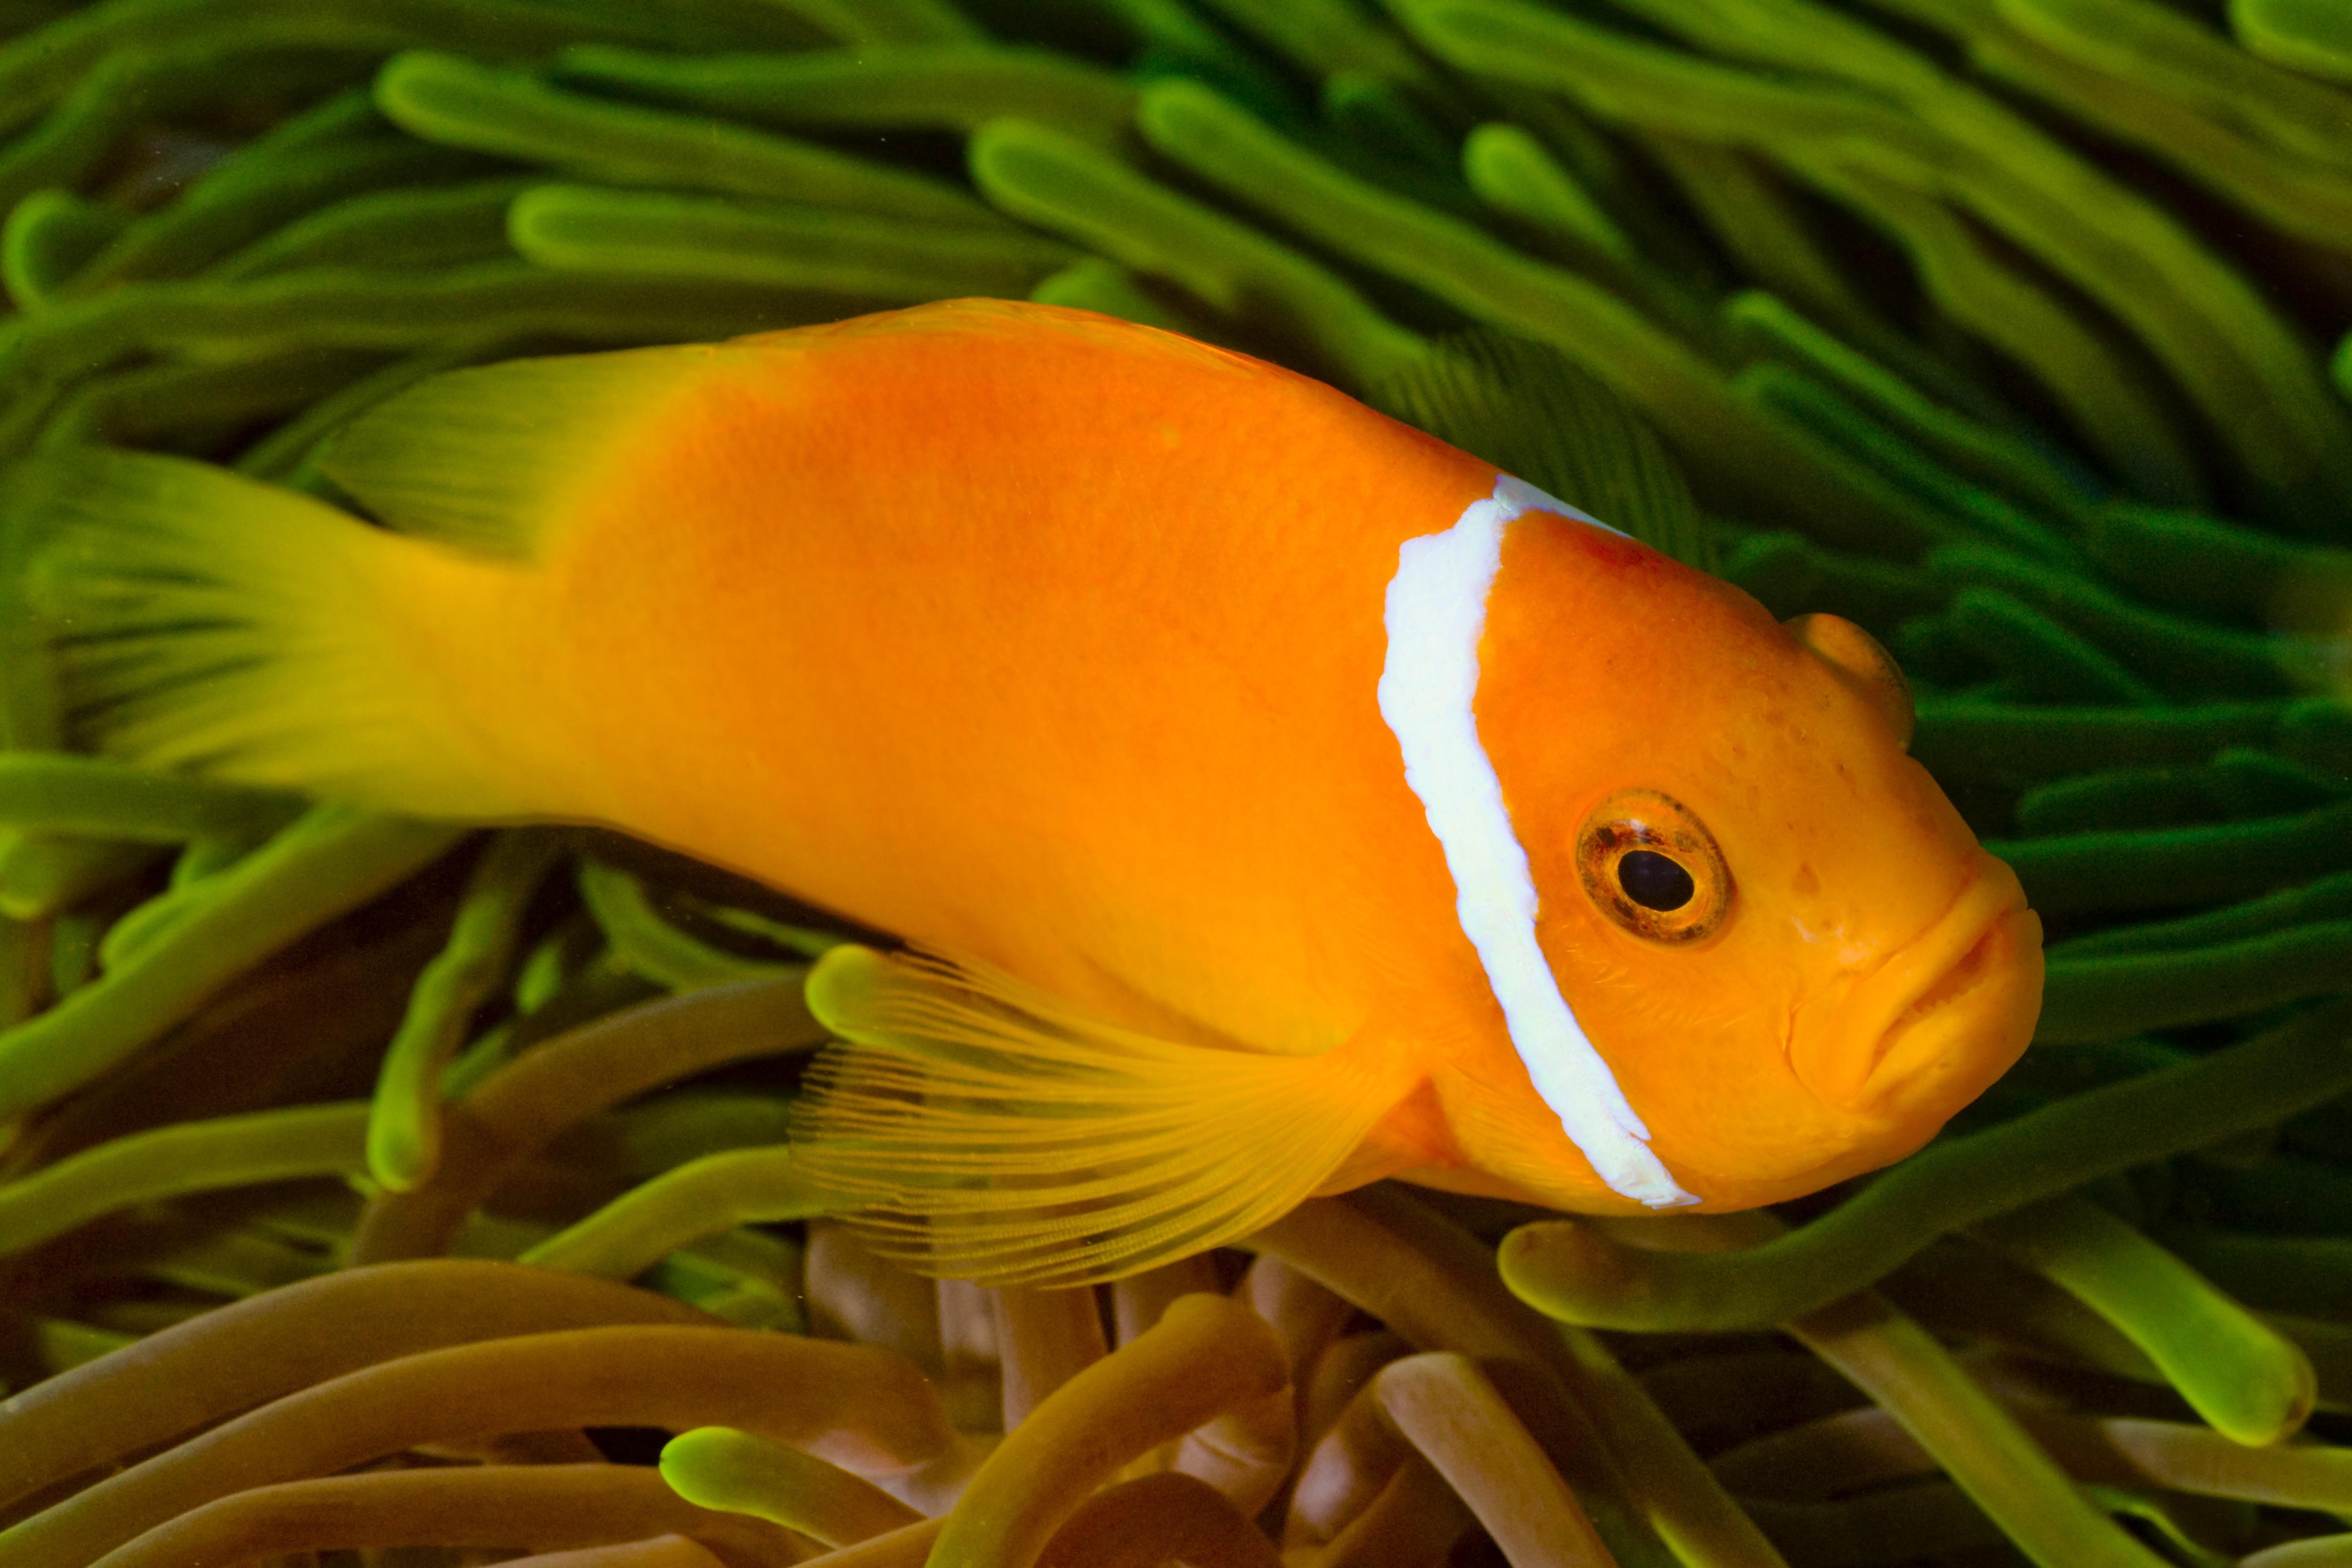 Free Images : ocean, flower, diving, underwater, yellow, trip, fauna, goldfish, safari, maldives ...